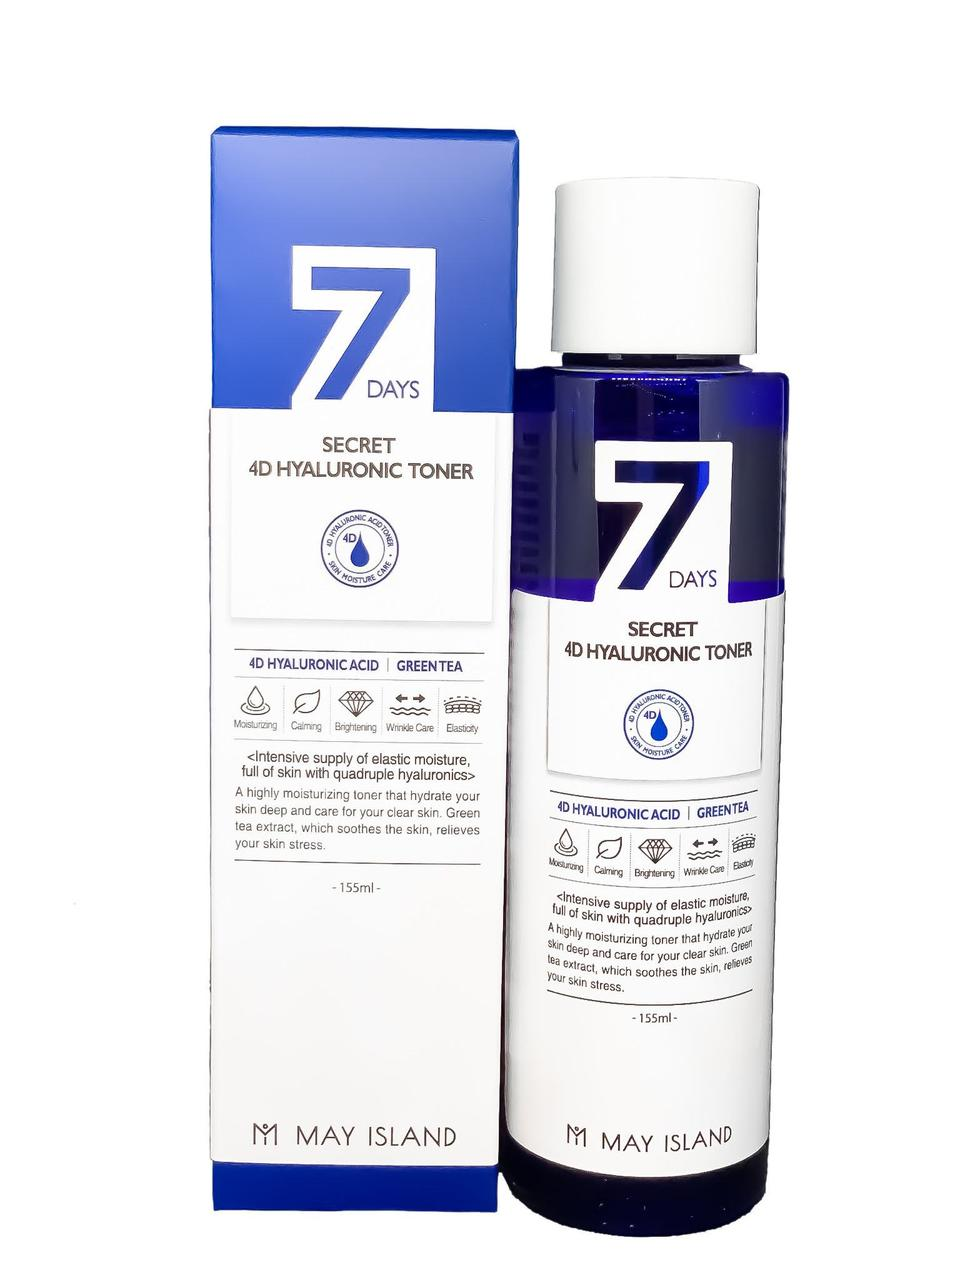 Тонер з 4 видами гіалуронової кислоти MAY ISLAND 7 Days Secret 4D Hyaluronic toner